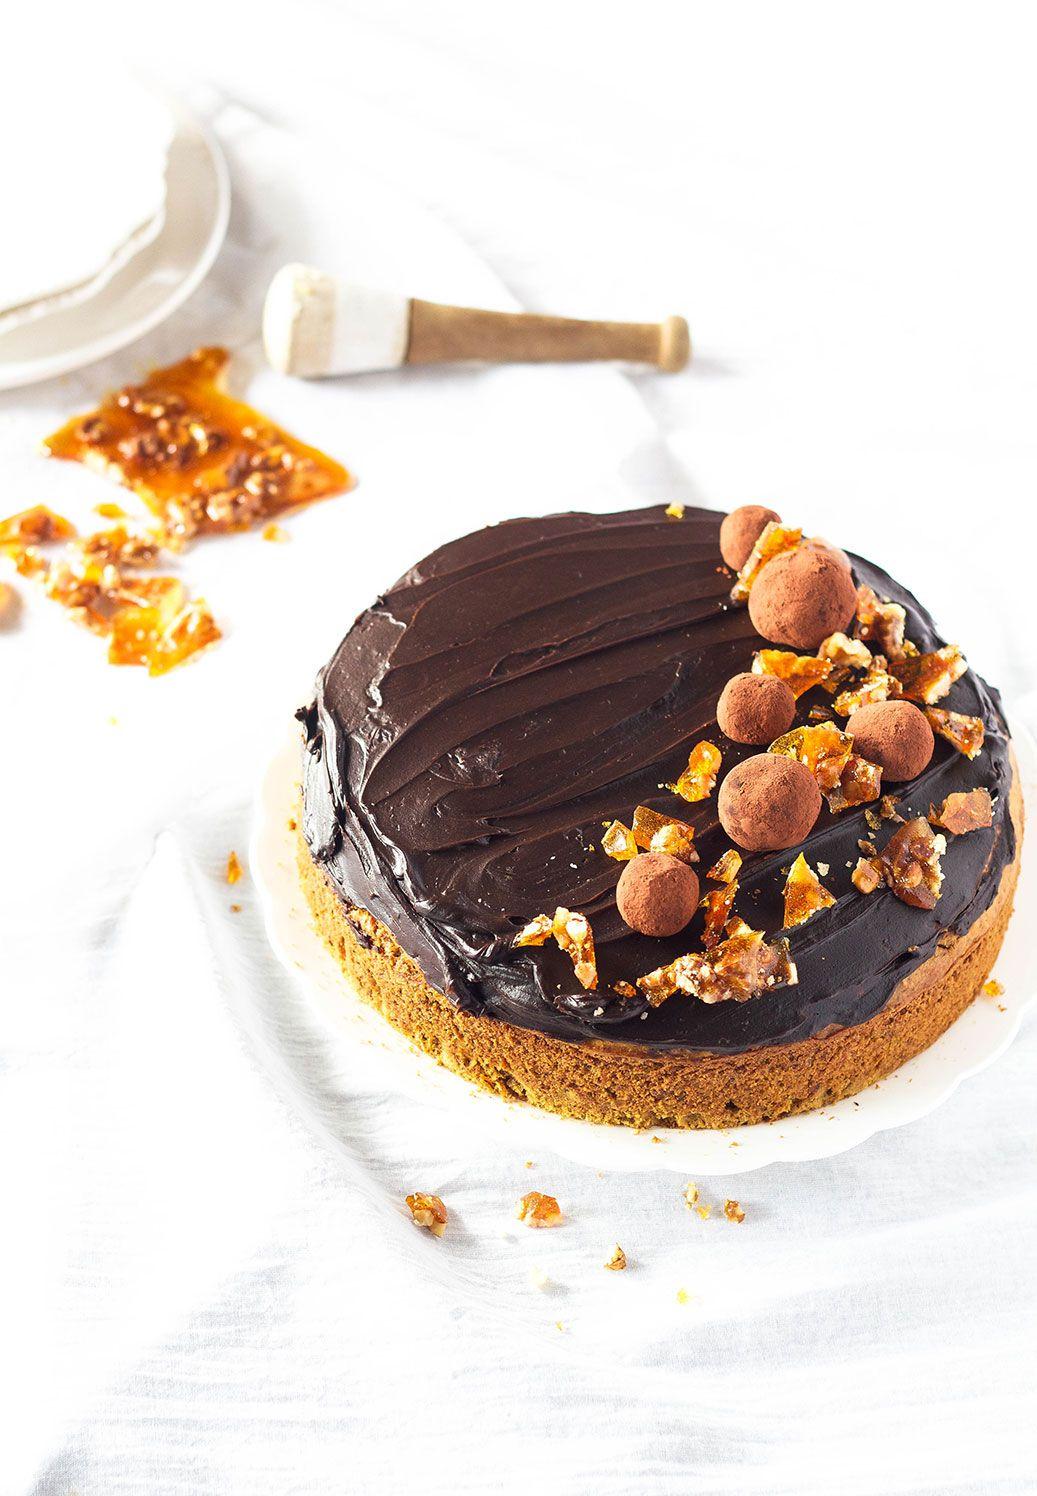 Chocolate carrot cake recipe chocolate carrot cake